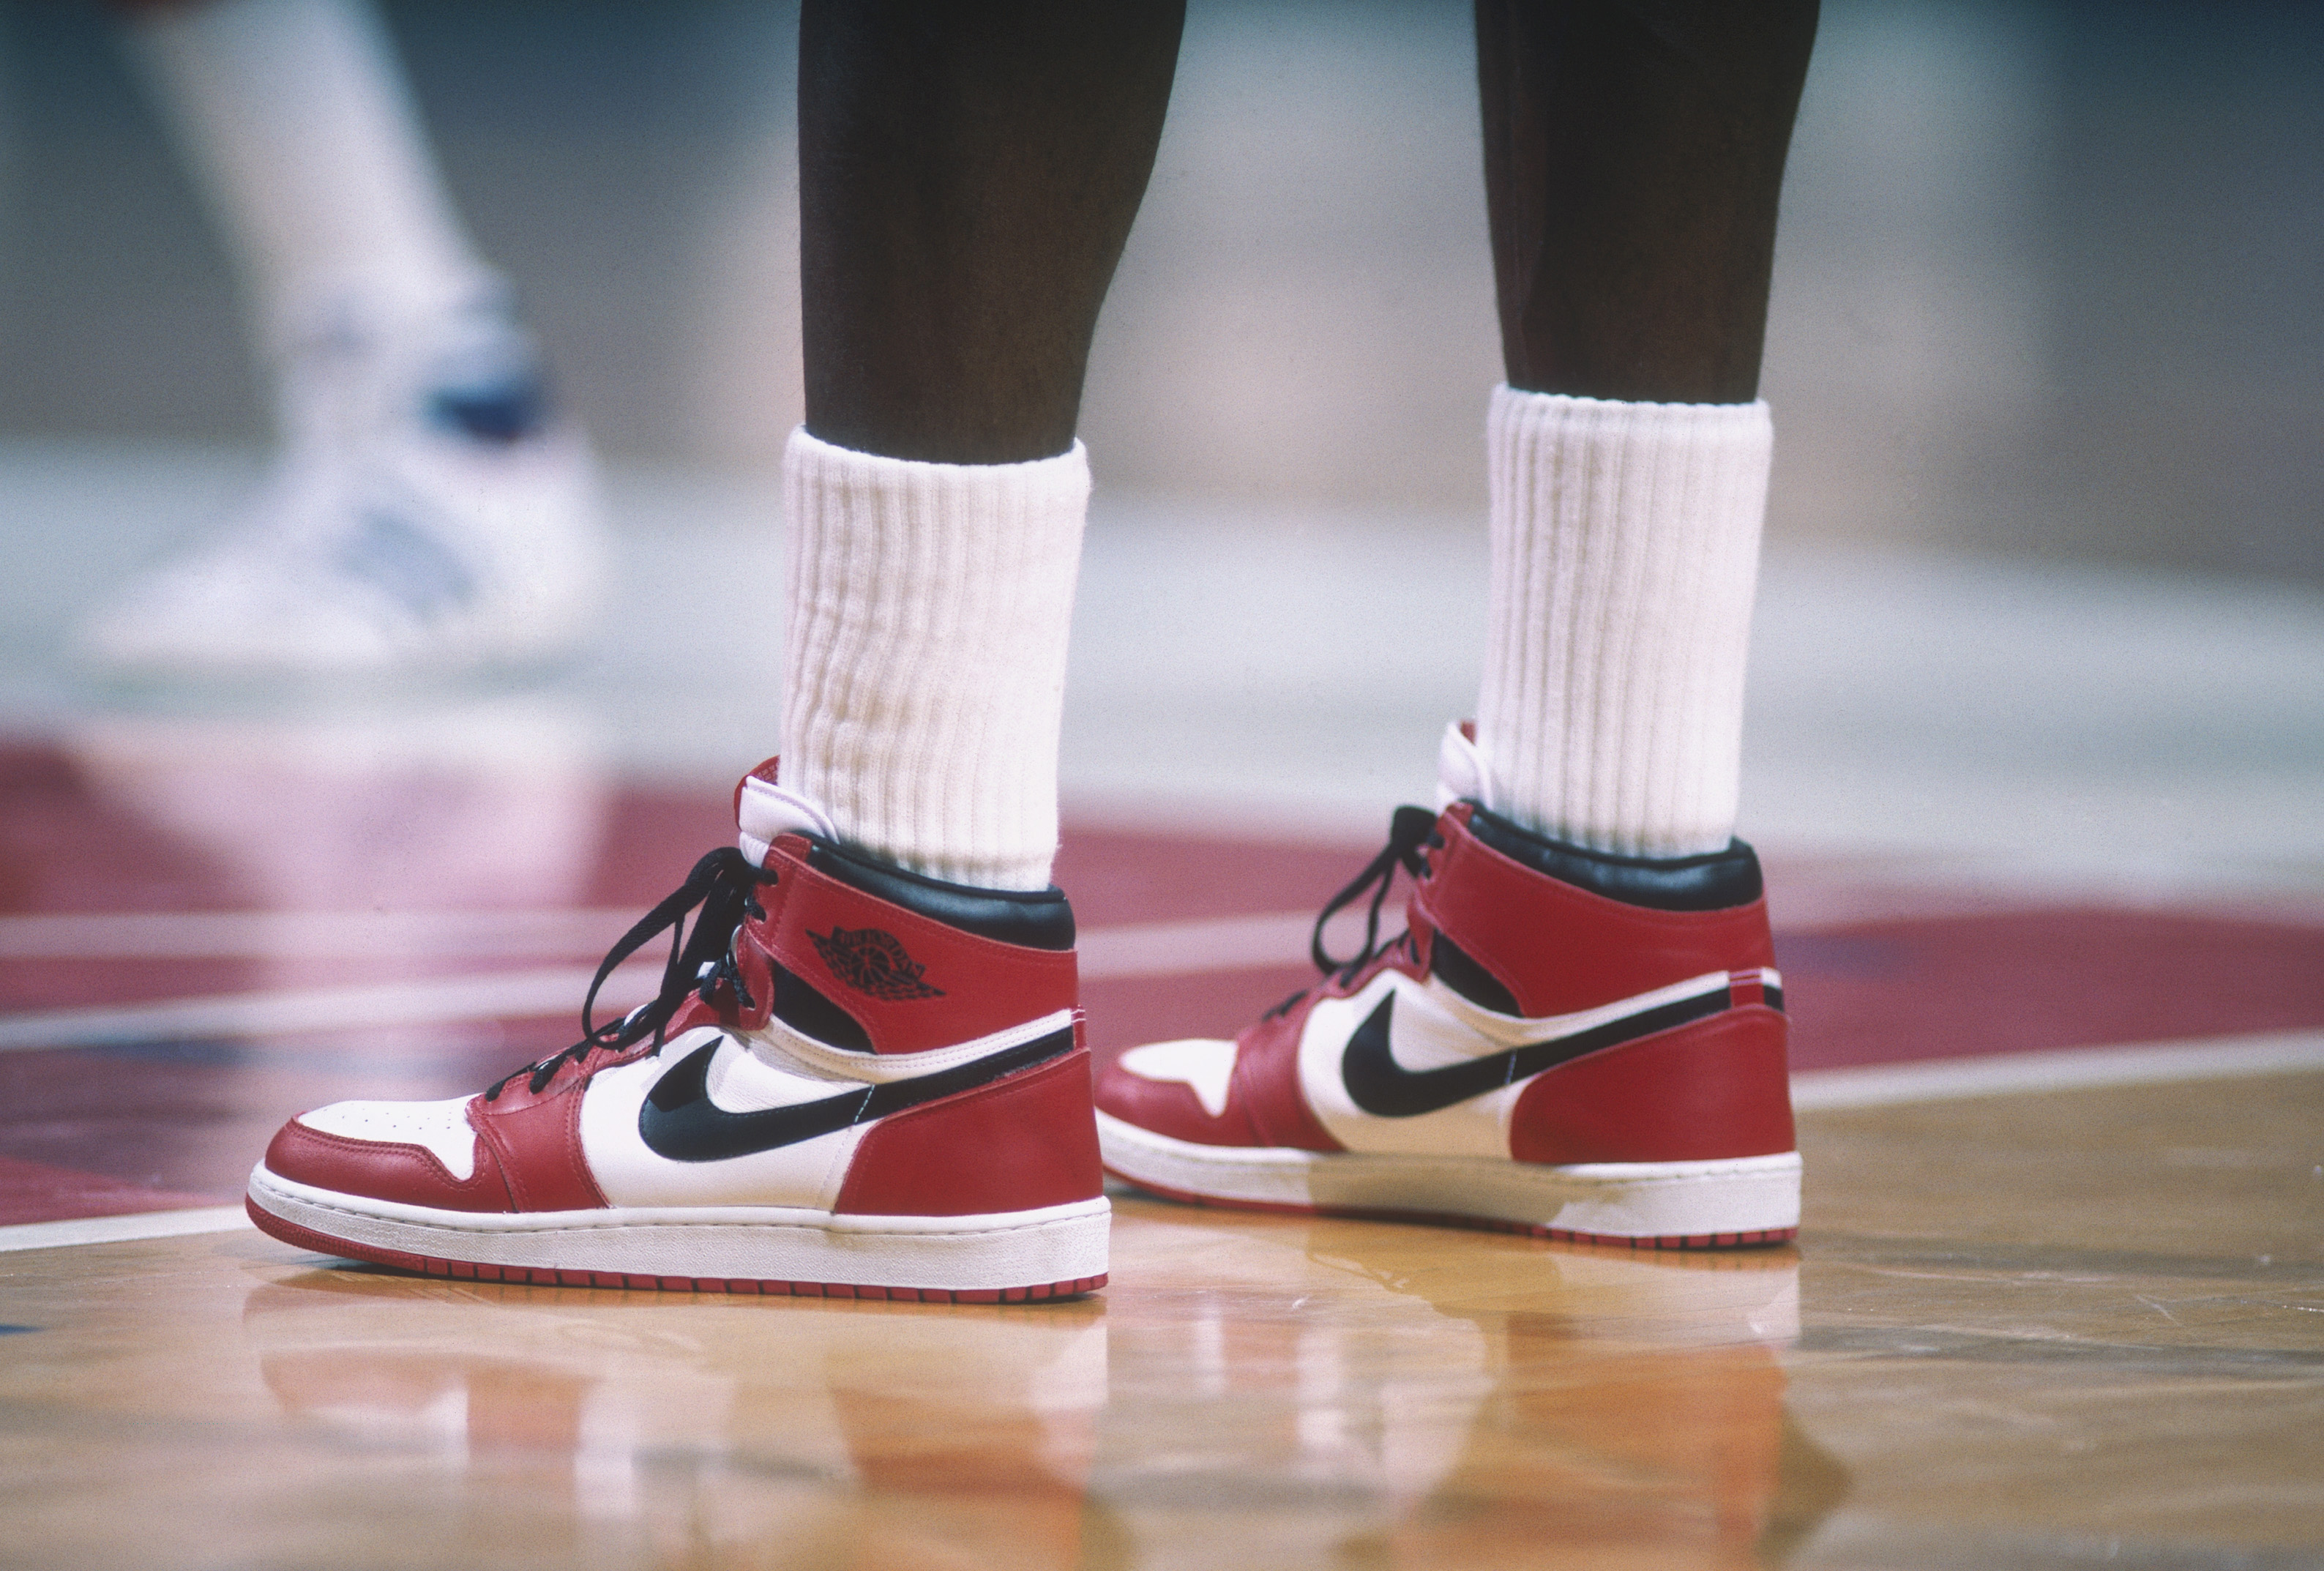 Michael Jordan's signed, game-worn Jordan 1s sell for $560,000, breaking all-time record